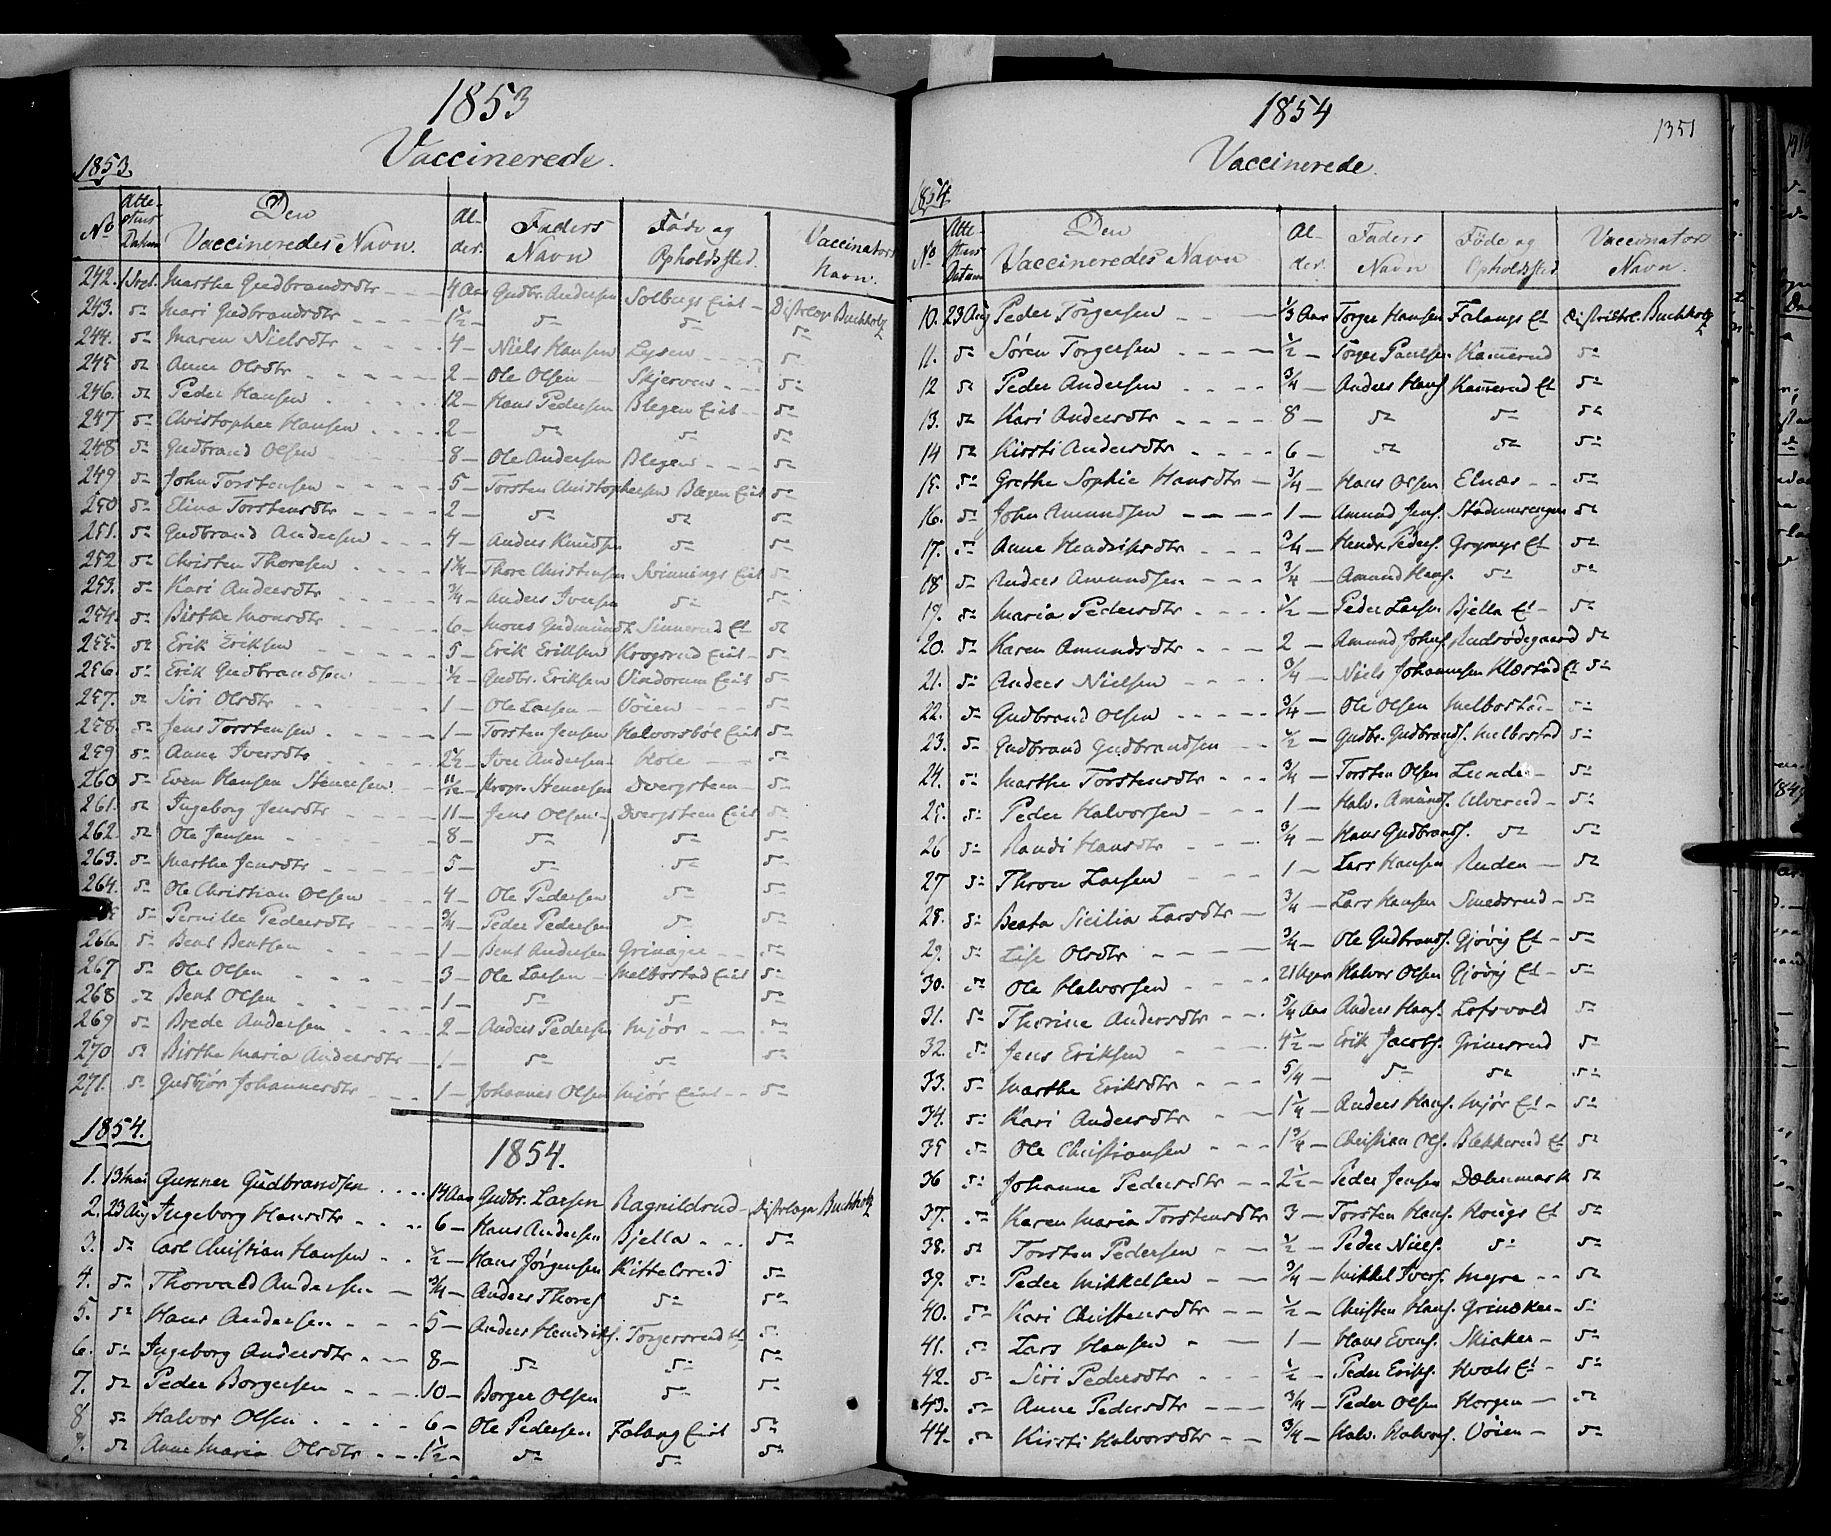 SAH, Gran prestekontor, Ministerialbok nr. 11, 1842-1856, s. 1350-1351